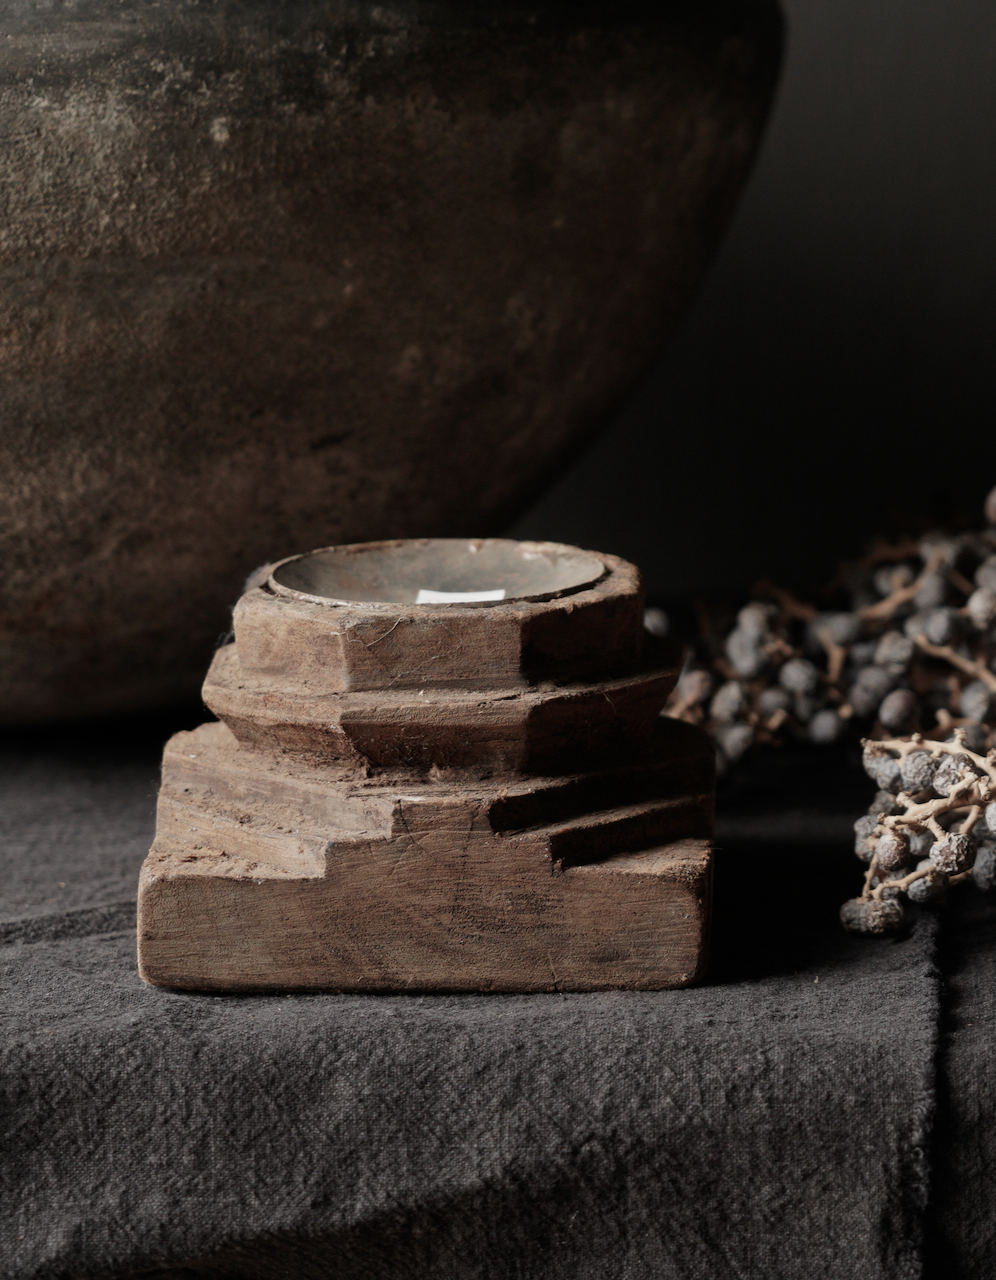 Houten Kandelaars van oud ornament-5